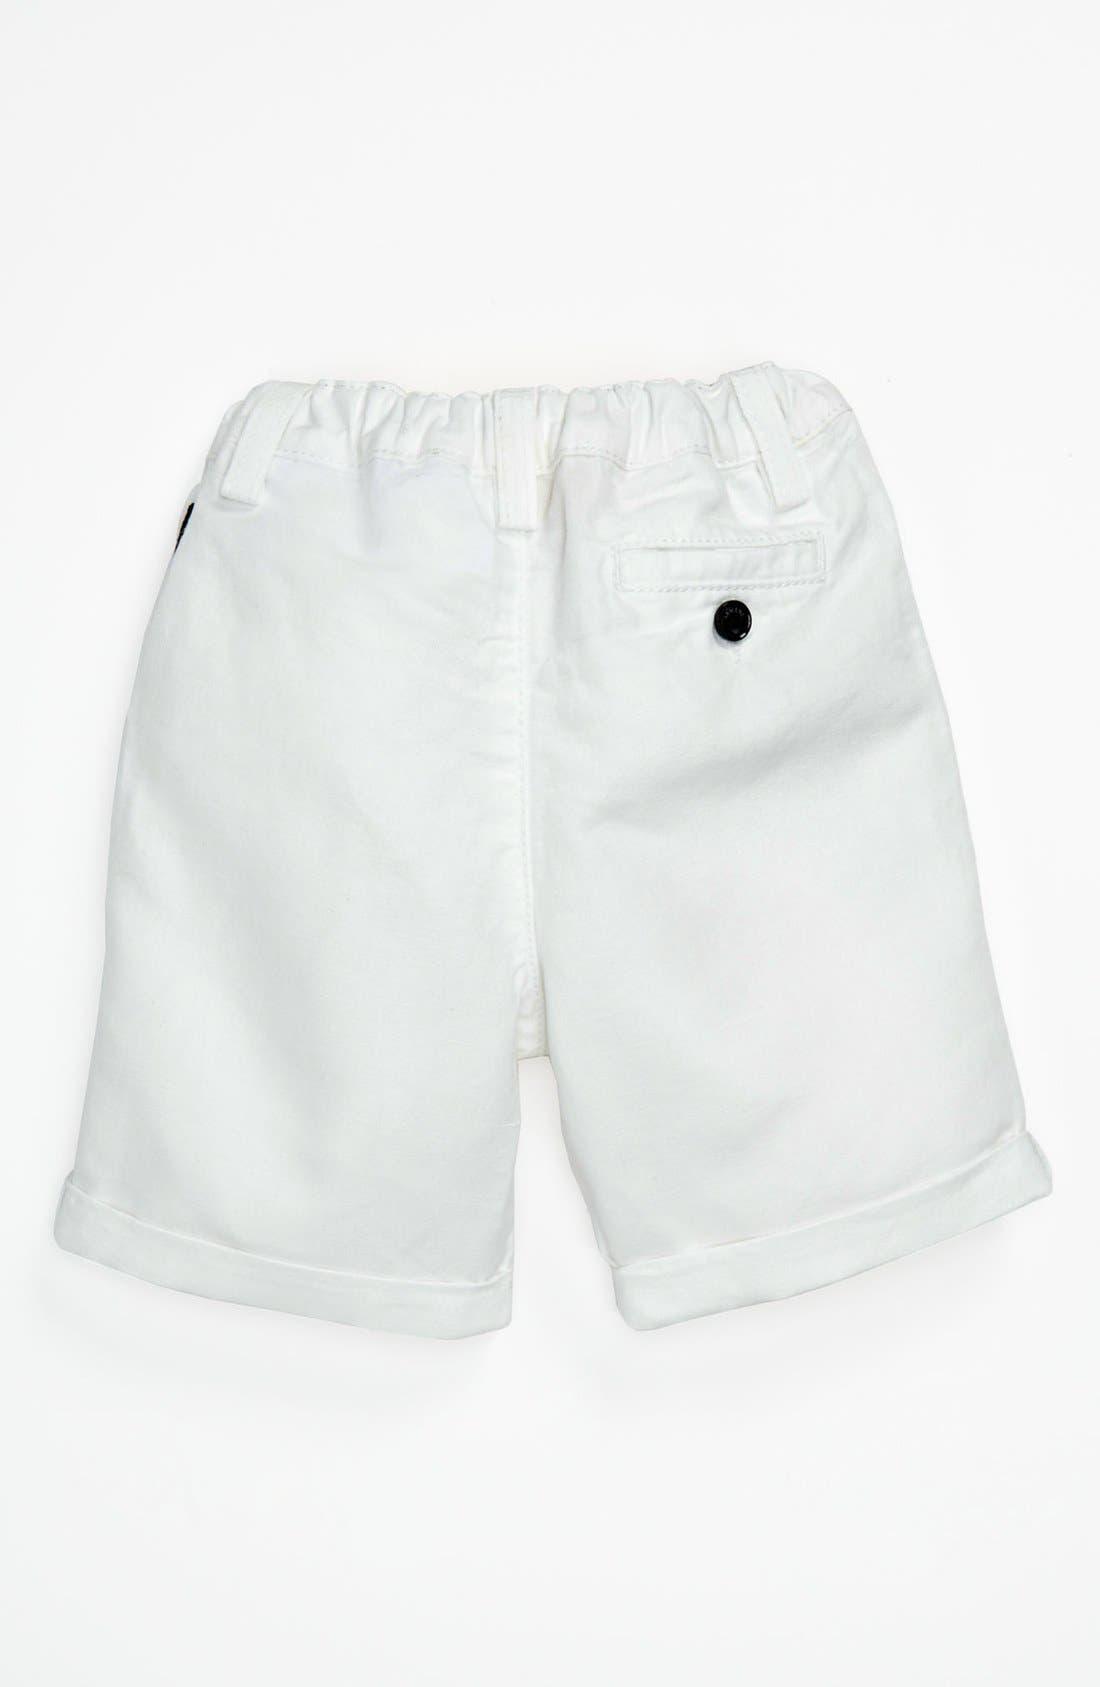 Alternate Image 2  - Armani Junior Shorts (Baby)